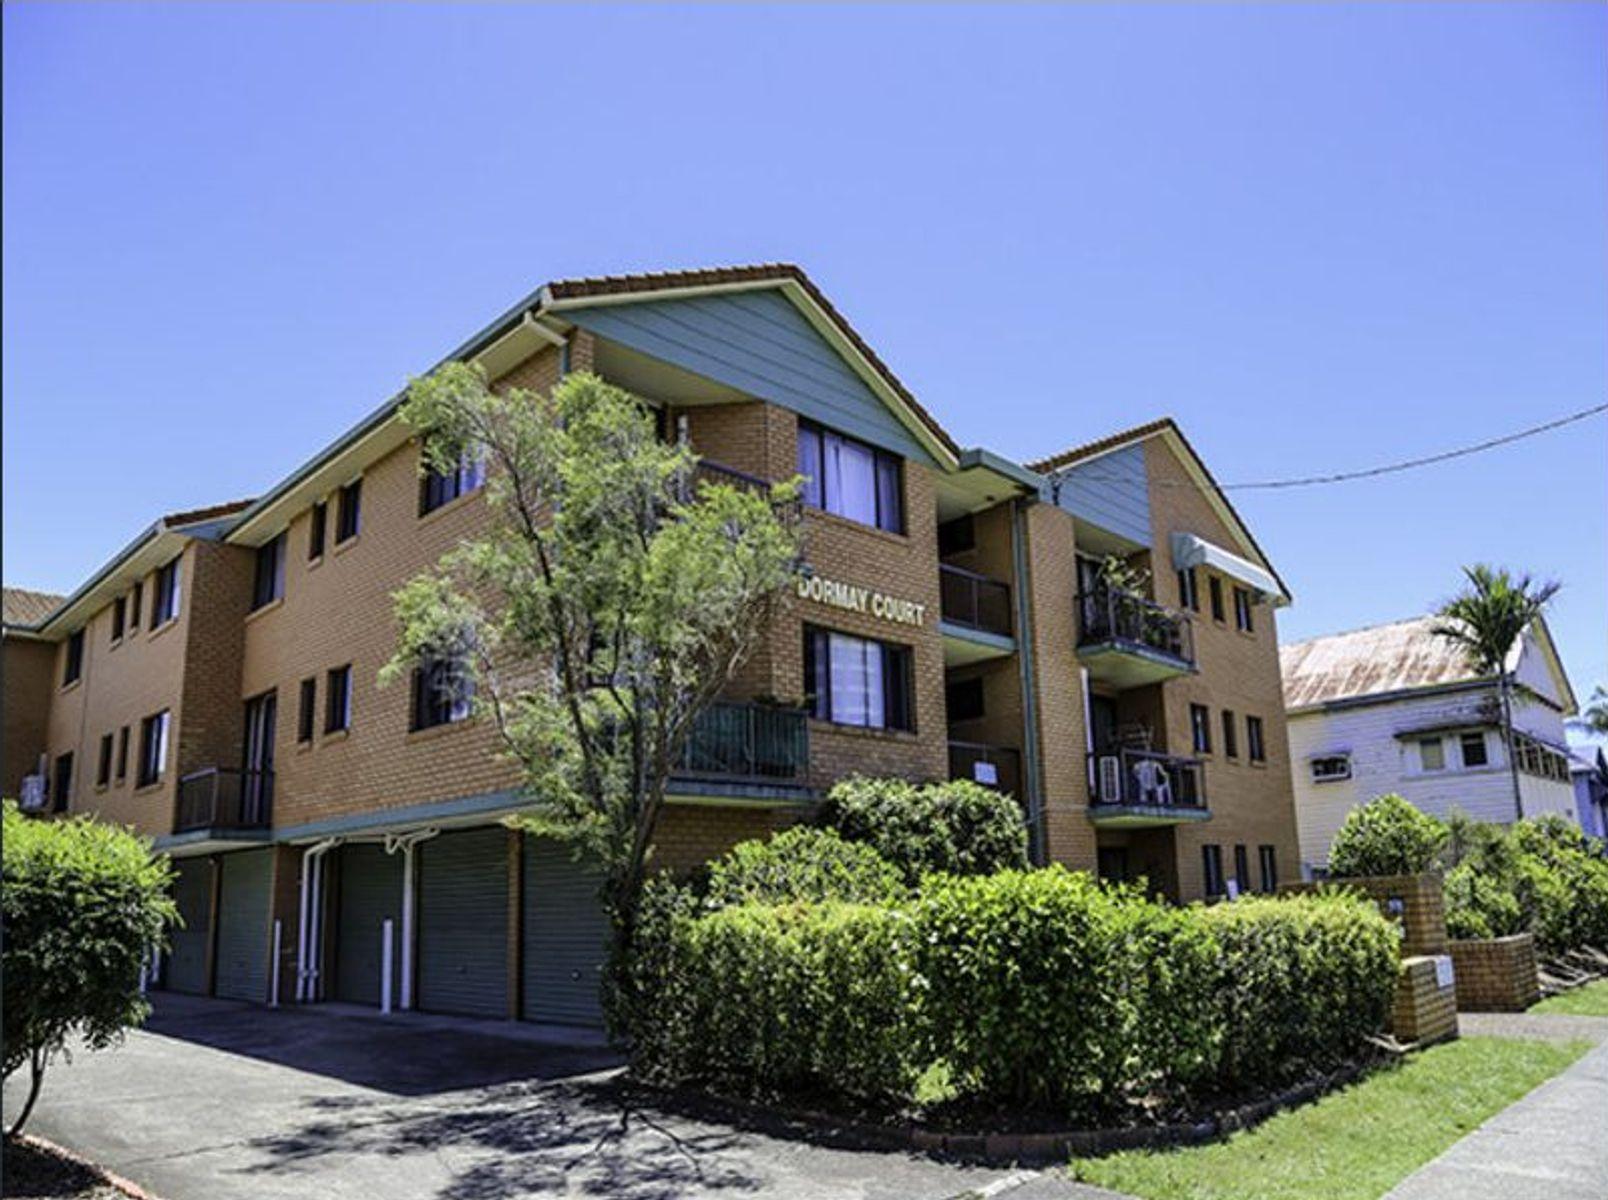 11/Unit 11/13-15 North street, Southport, QLD 4215